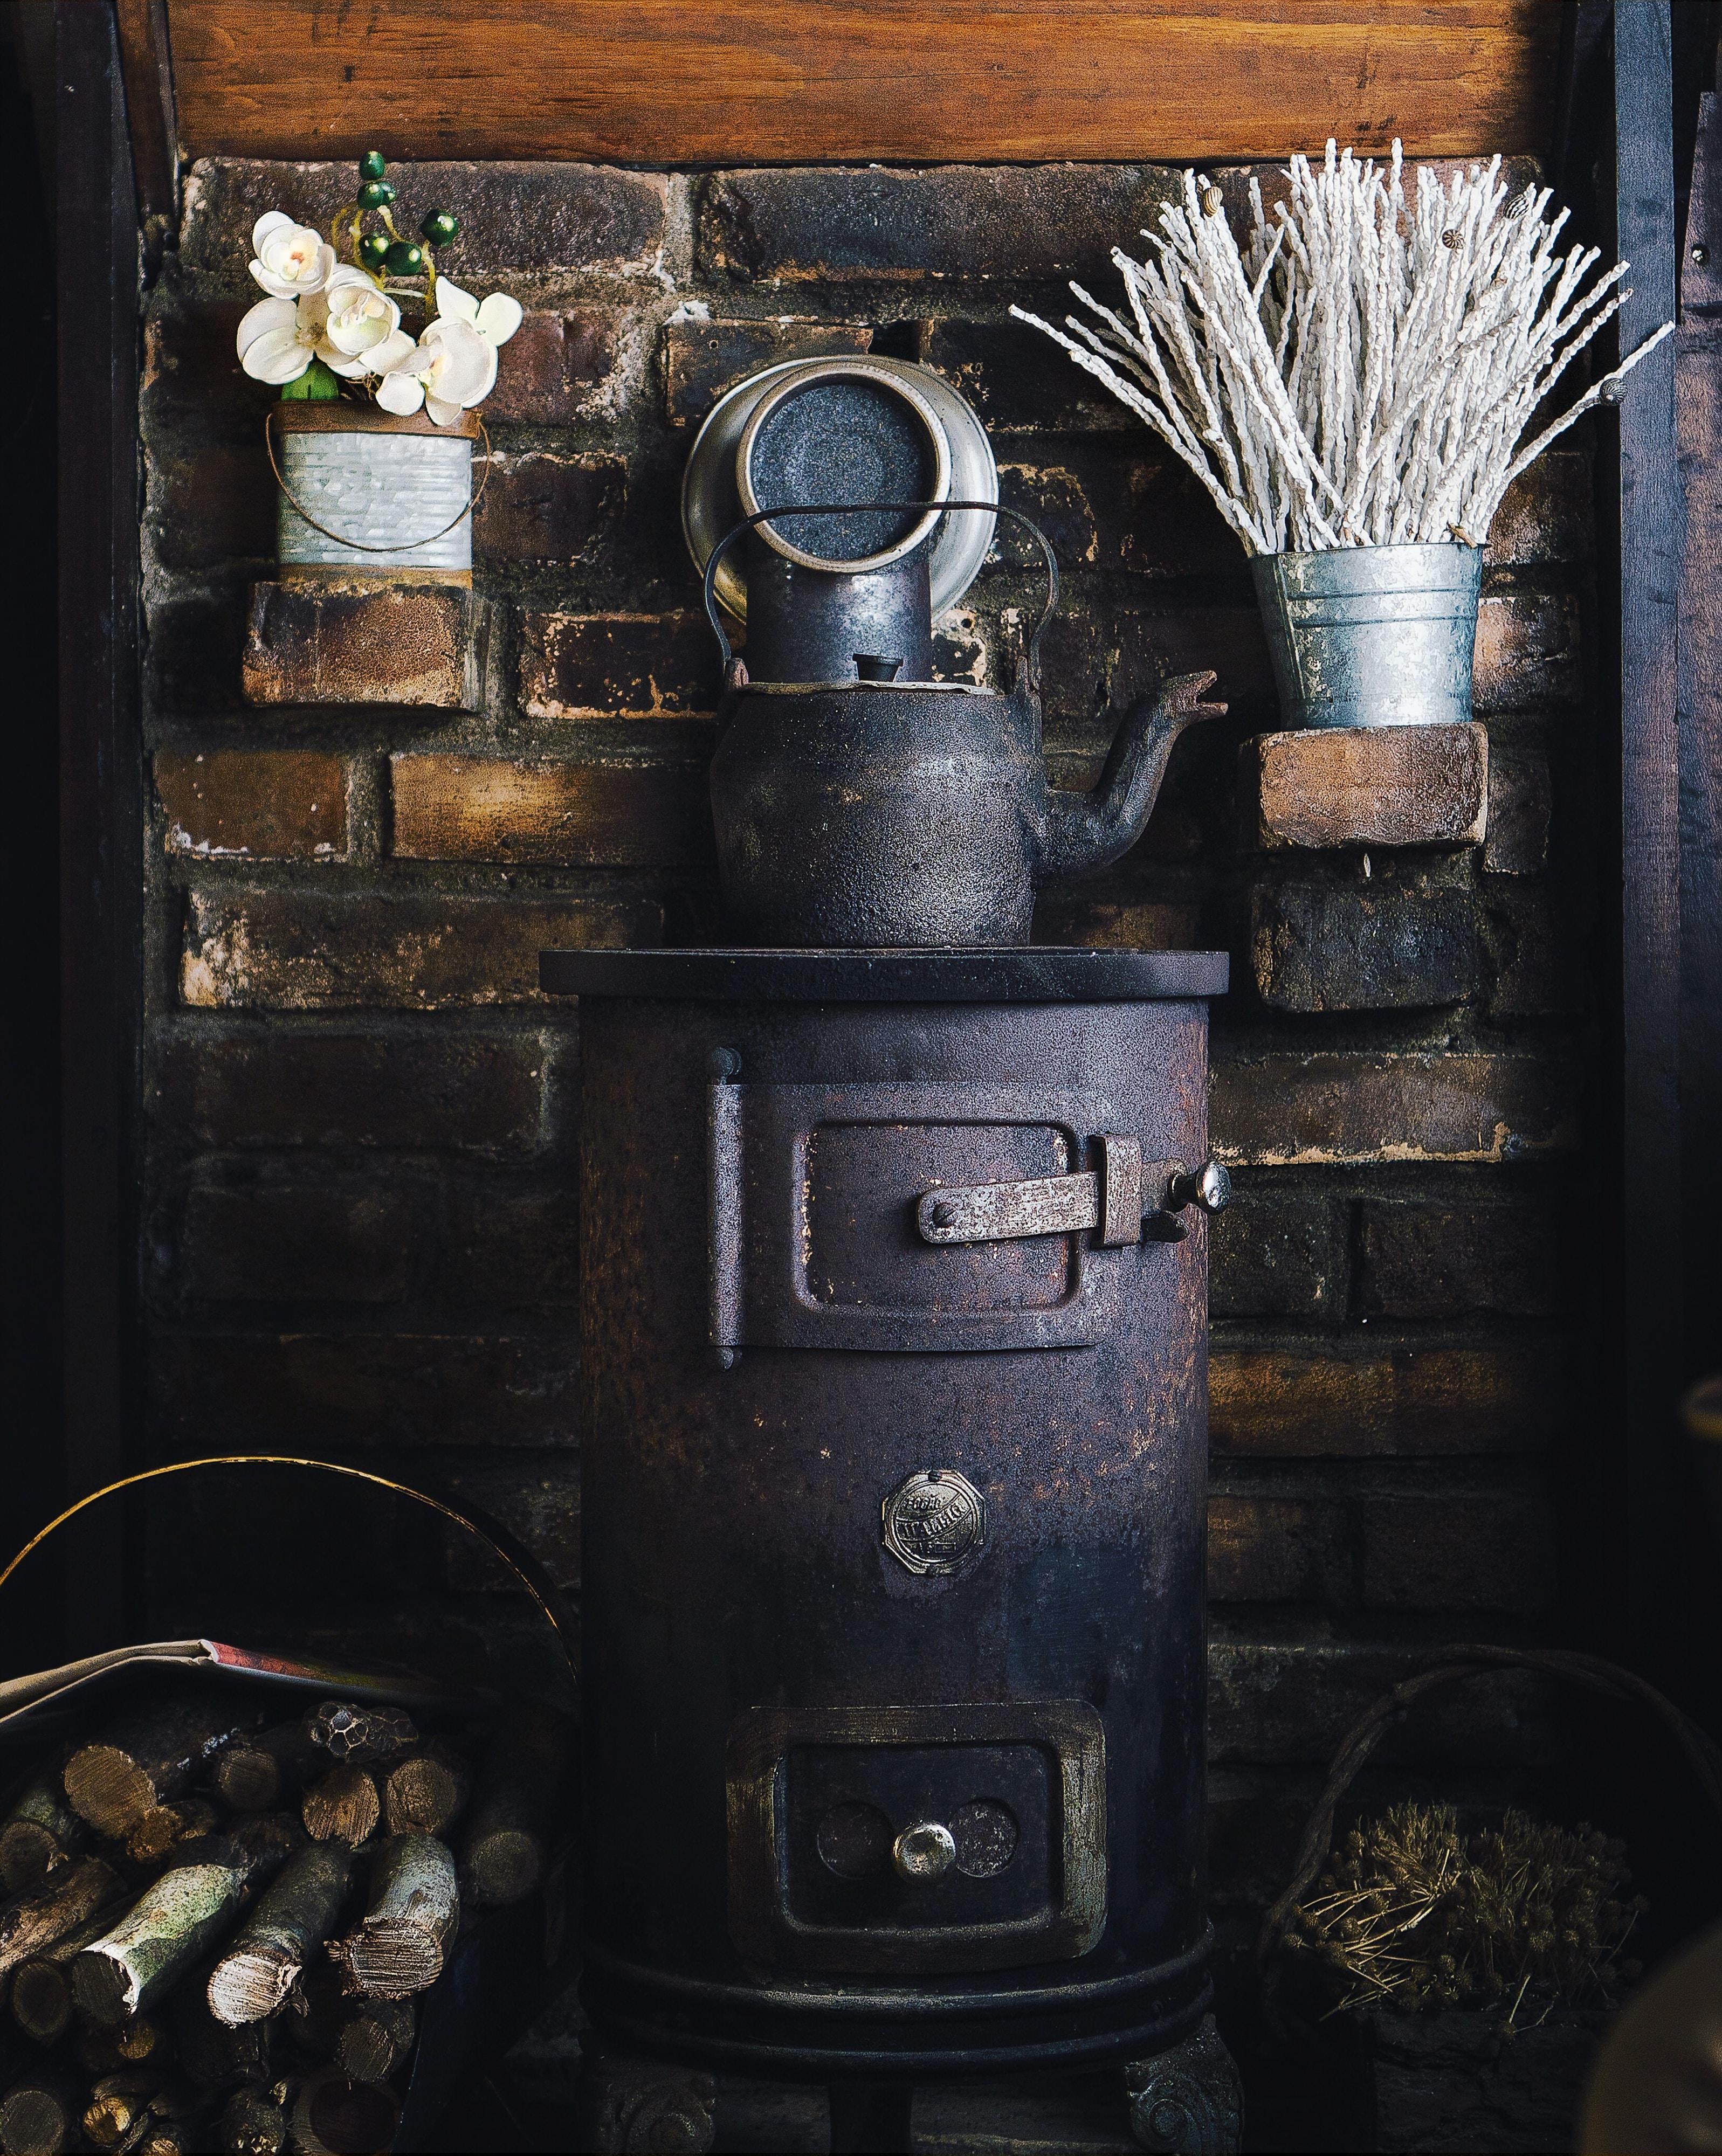 cast-iron teapot on wood burner